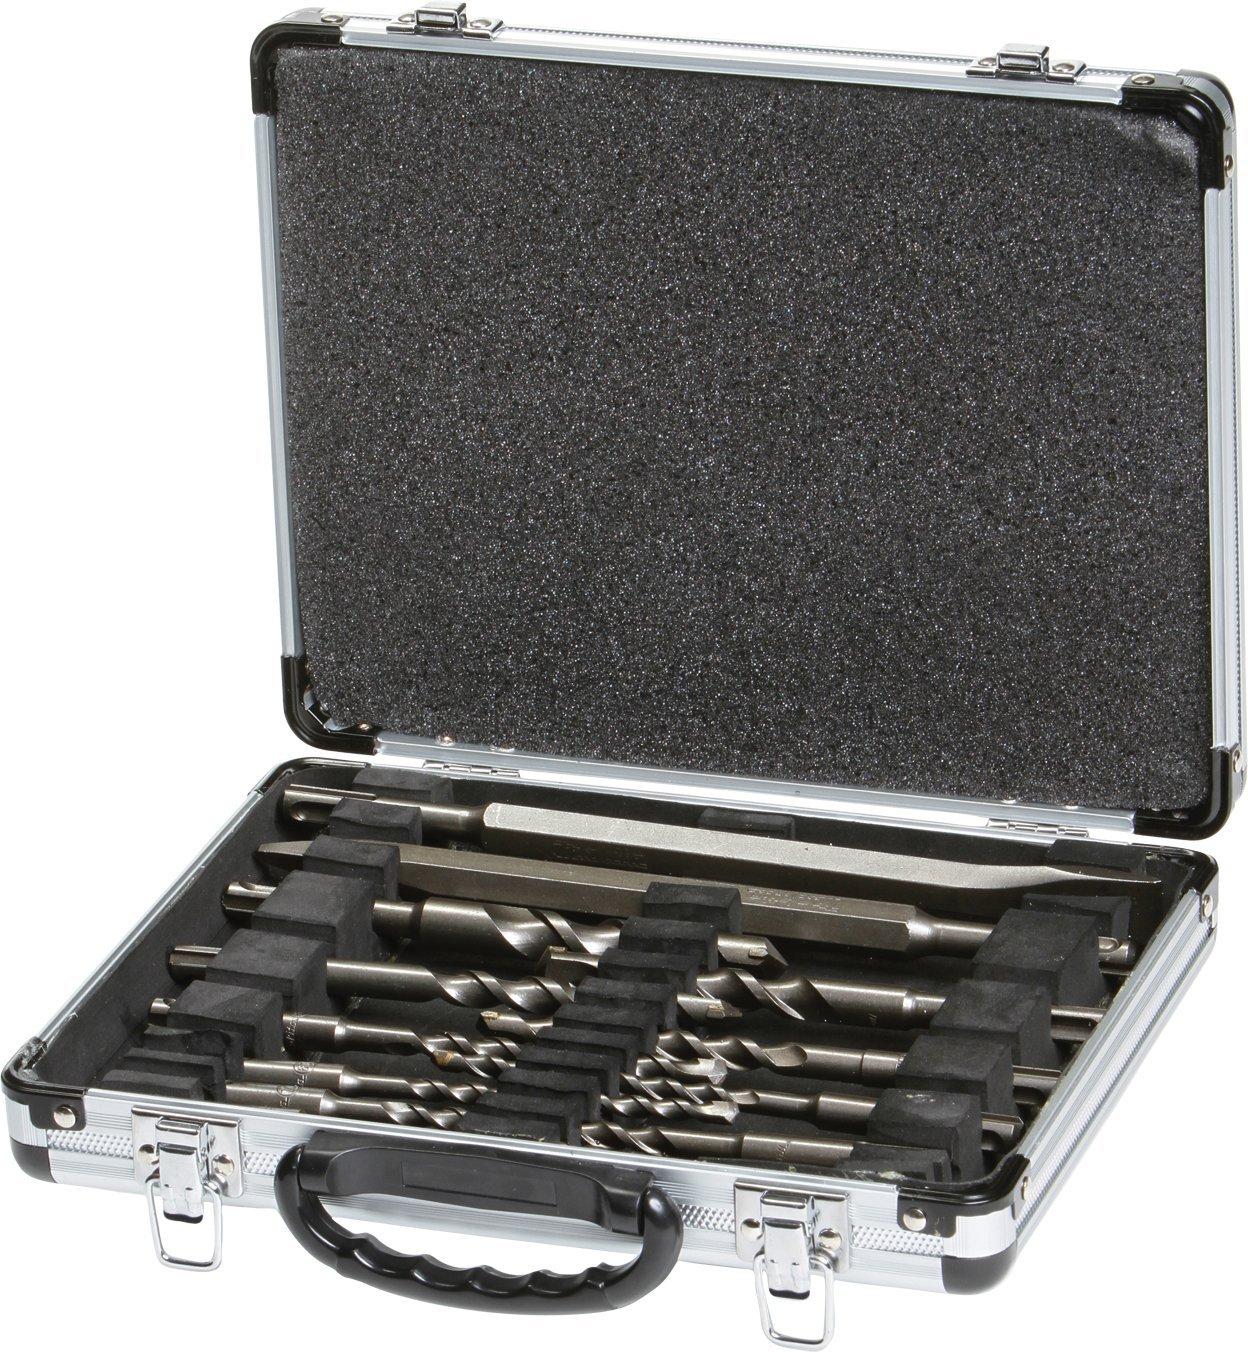 Makita 13 Piece Drill and Chisel Set SDS PLUS Aluminum Carry Case D-20111